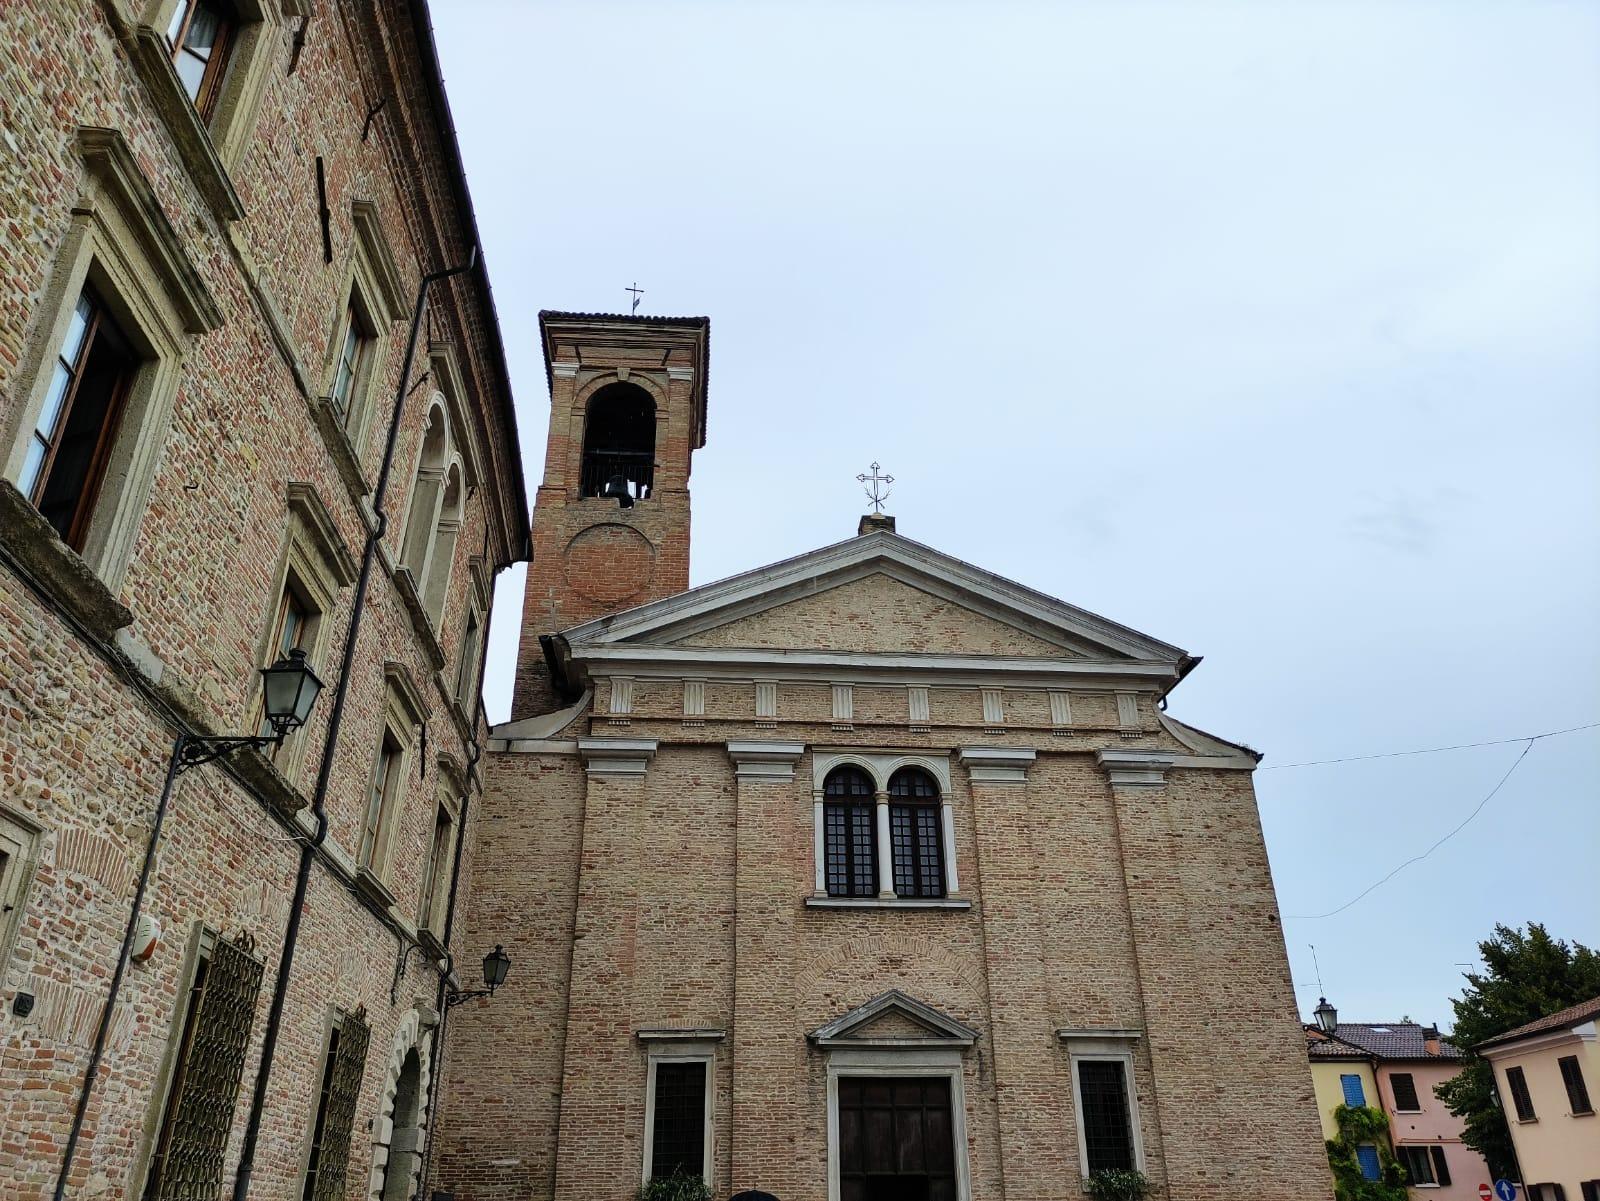 borgo12-1631096757.jpeg